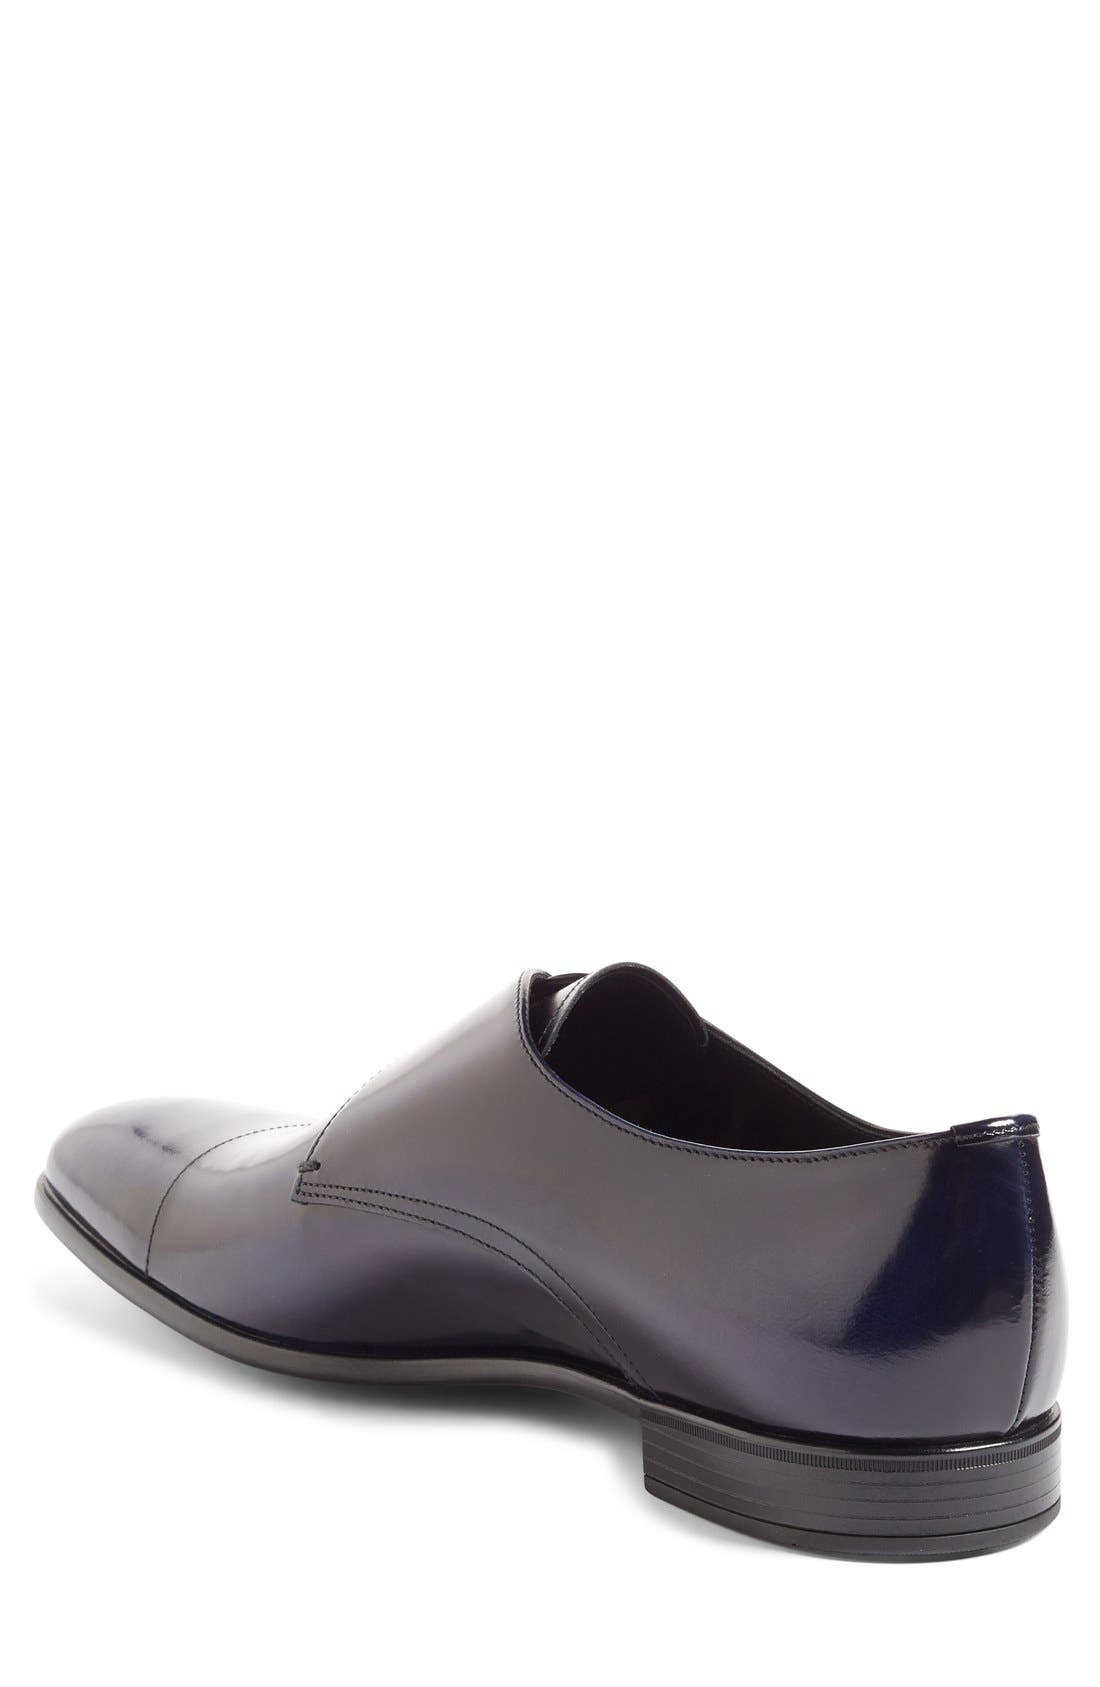 PRADA,                             Monk Strap Shoe,                             Alternate thumbnail 4, color,                             BLUE LEATHER